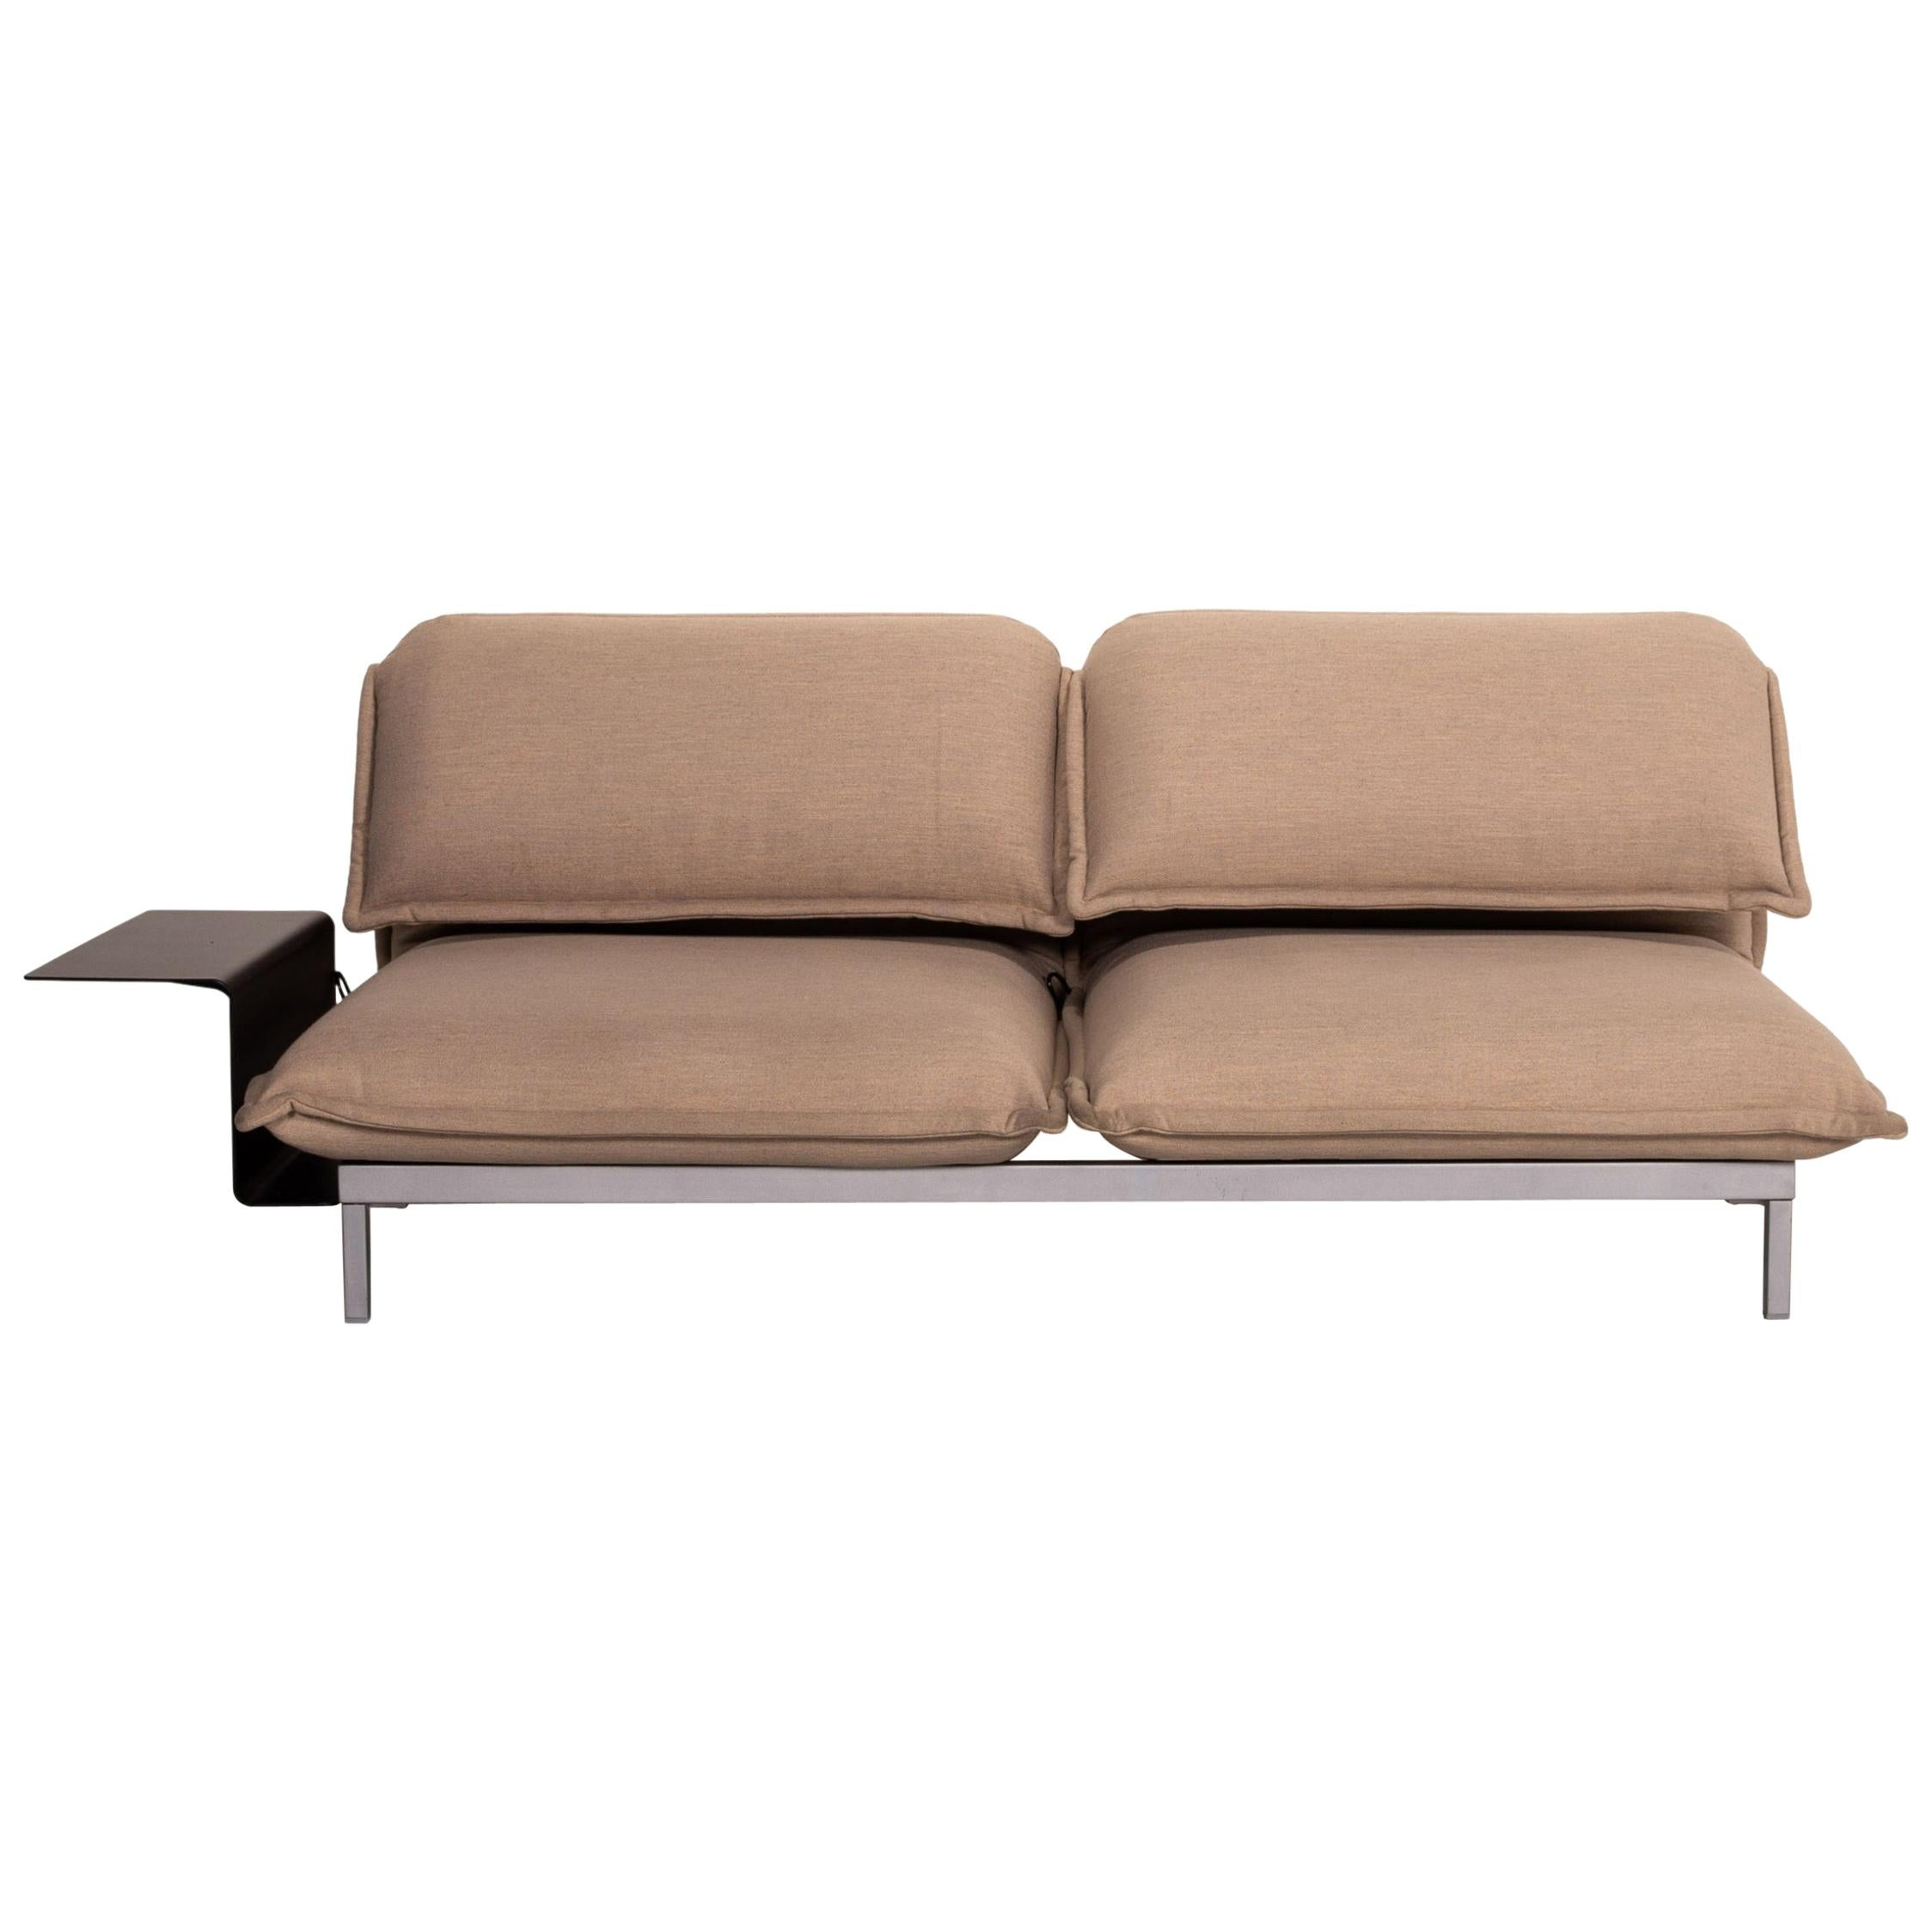 Rolf Benz Nova Fabric Sofa Beige Sleeping Function Relaxation Function Sofa Bed